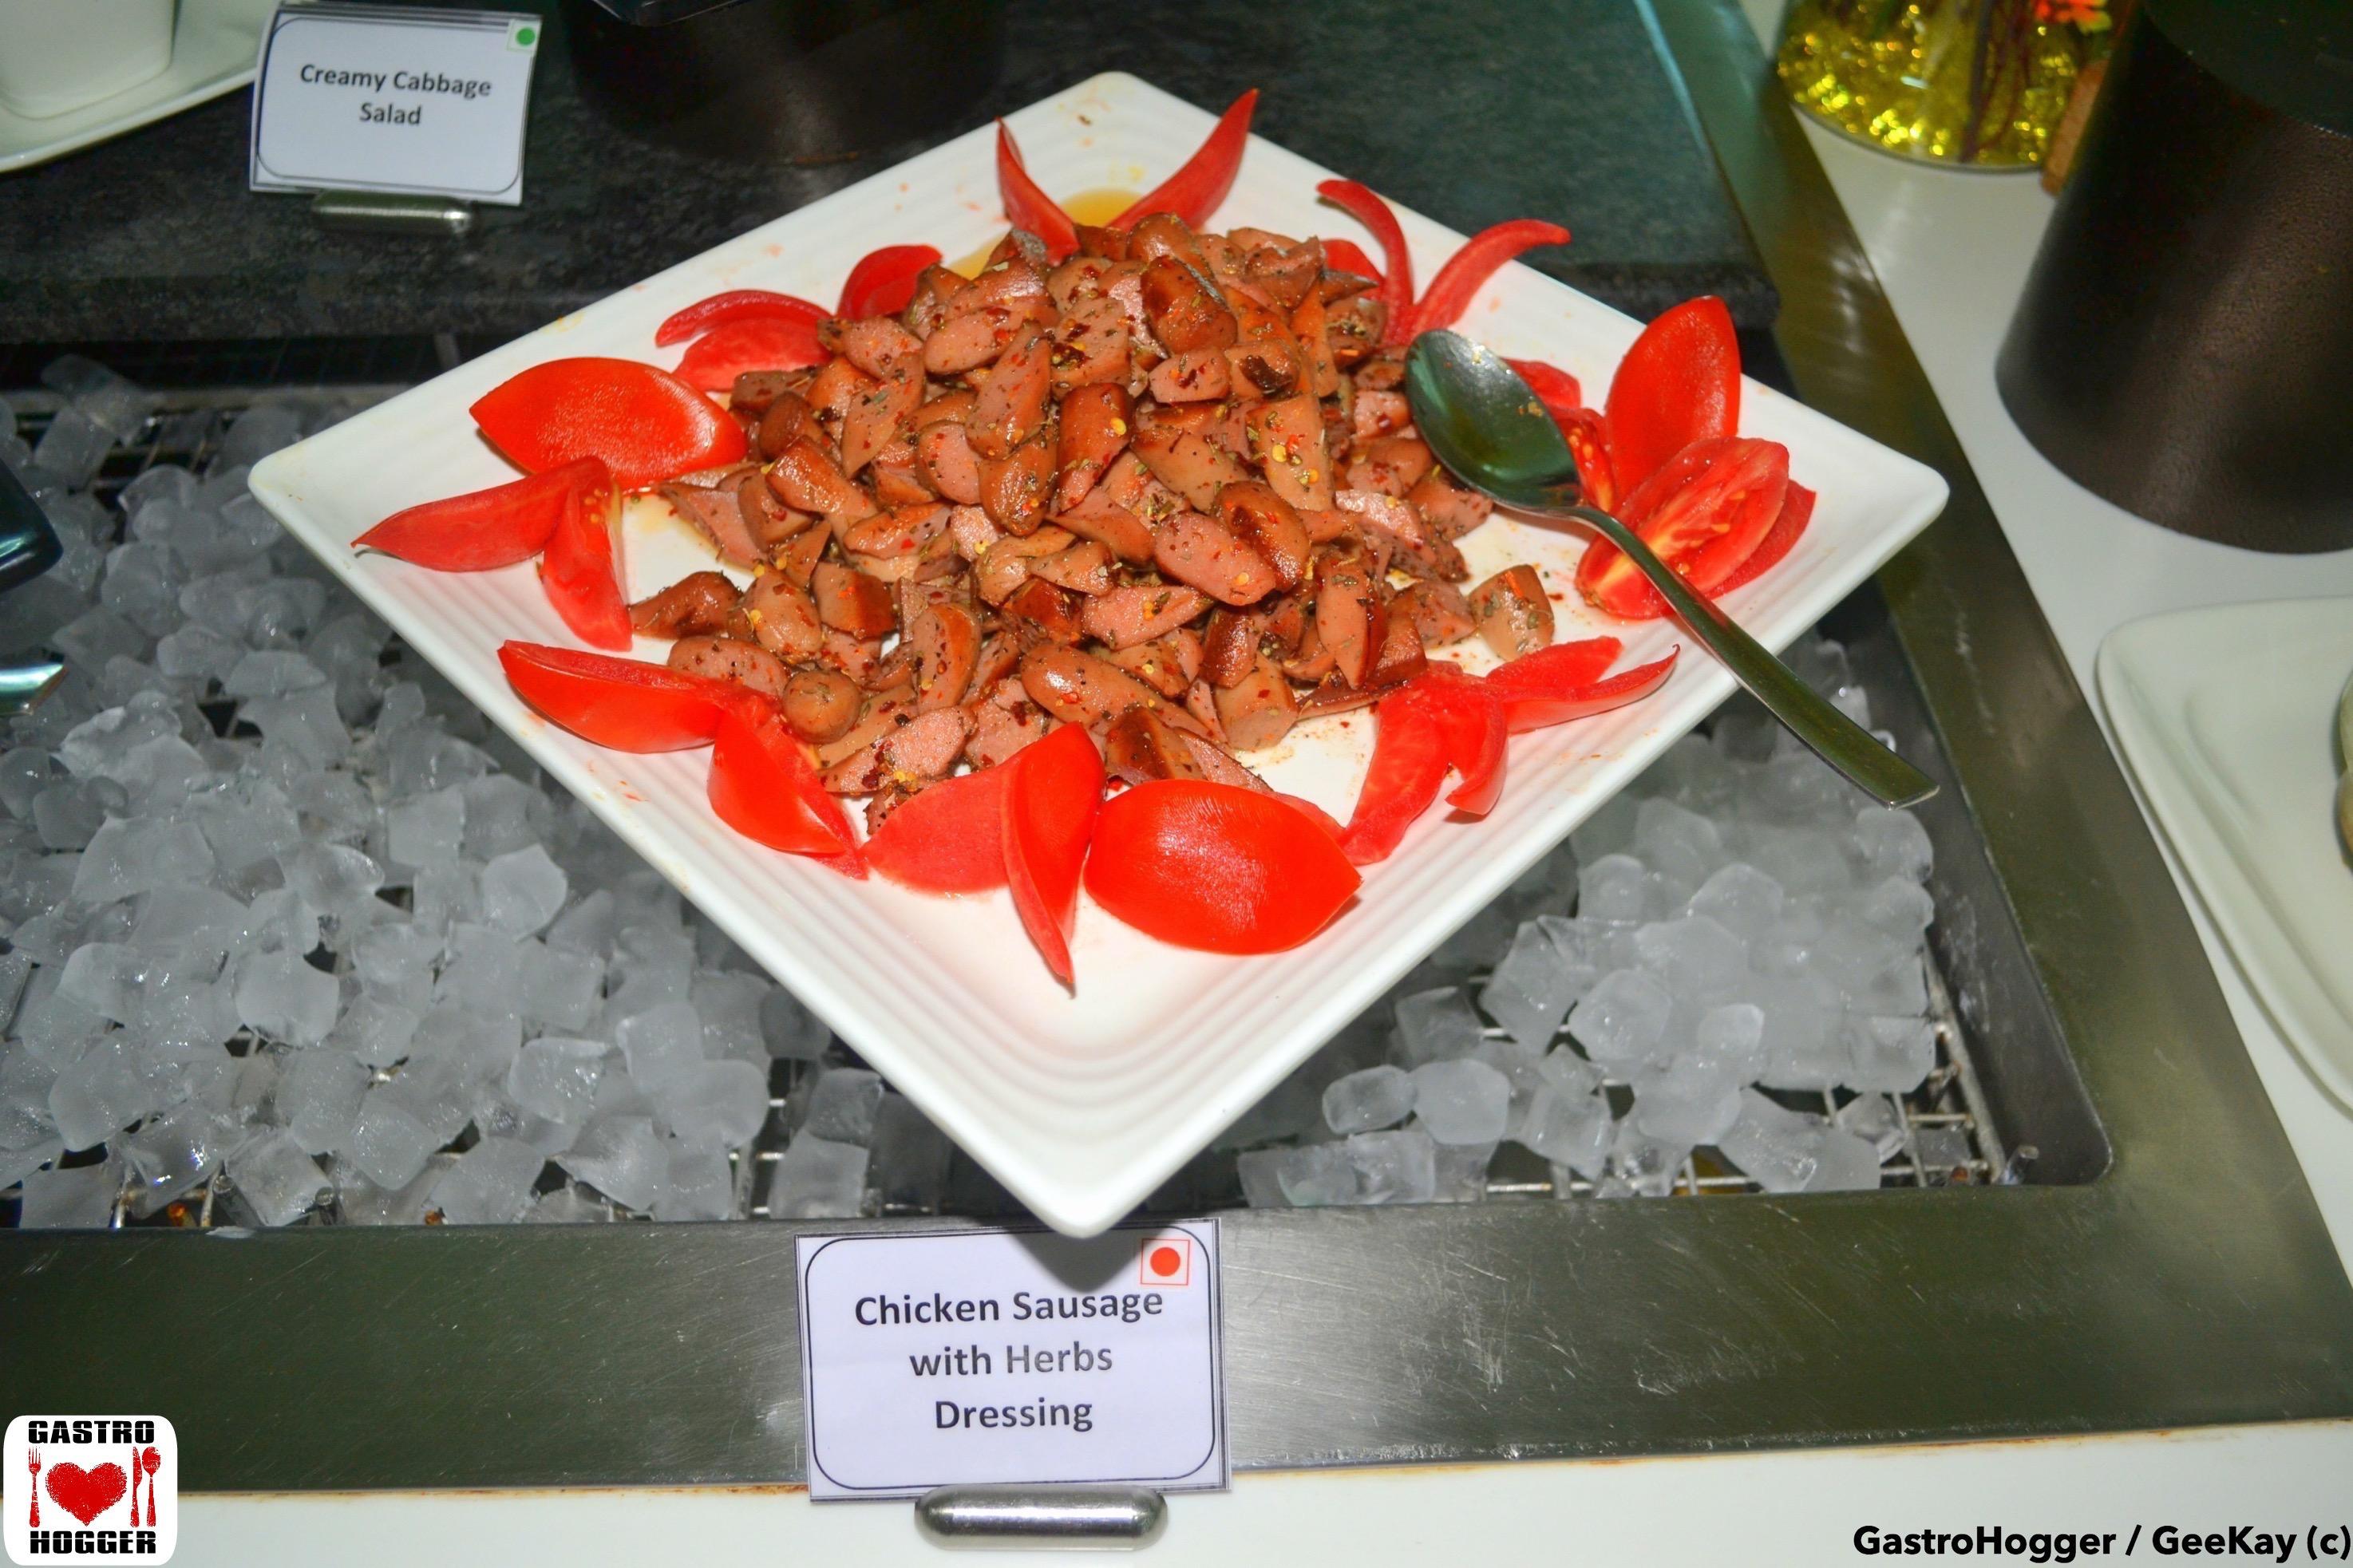 Chicken Sausage with Herbs Salad